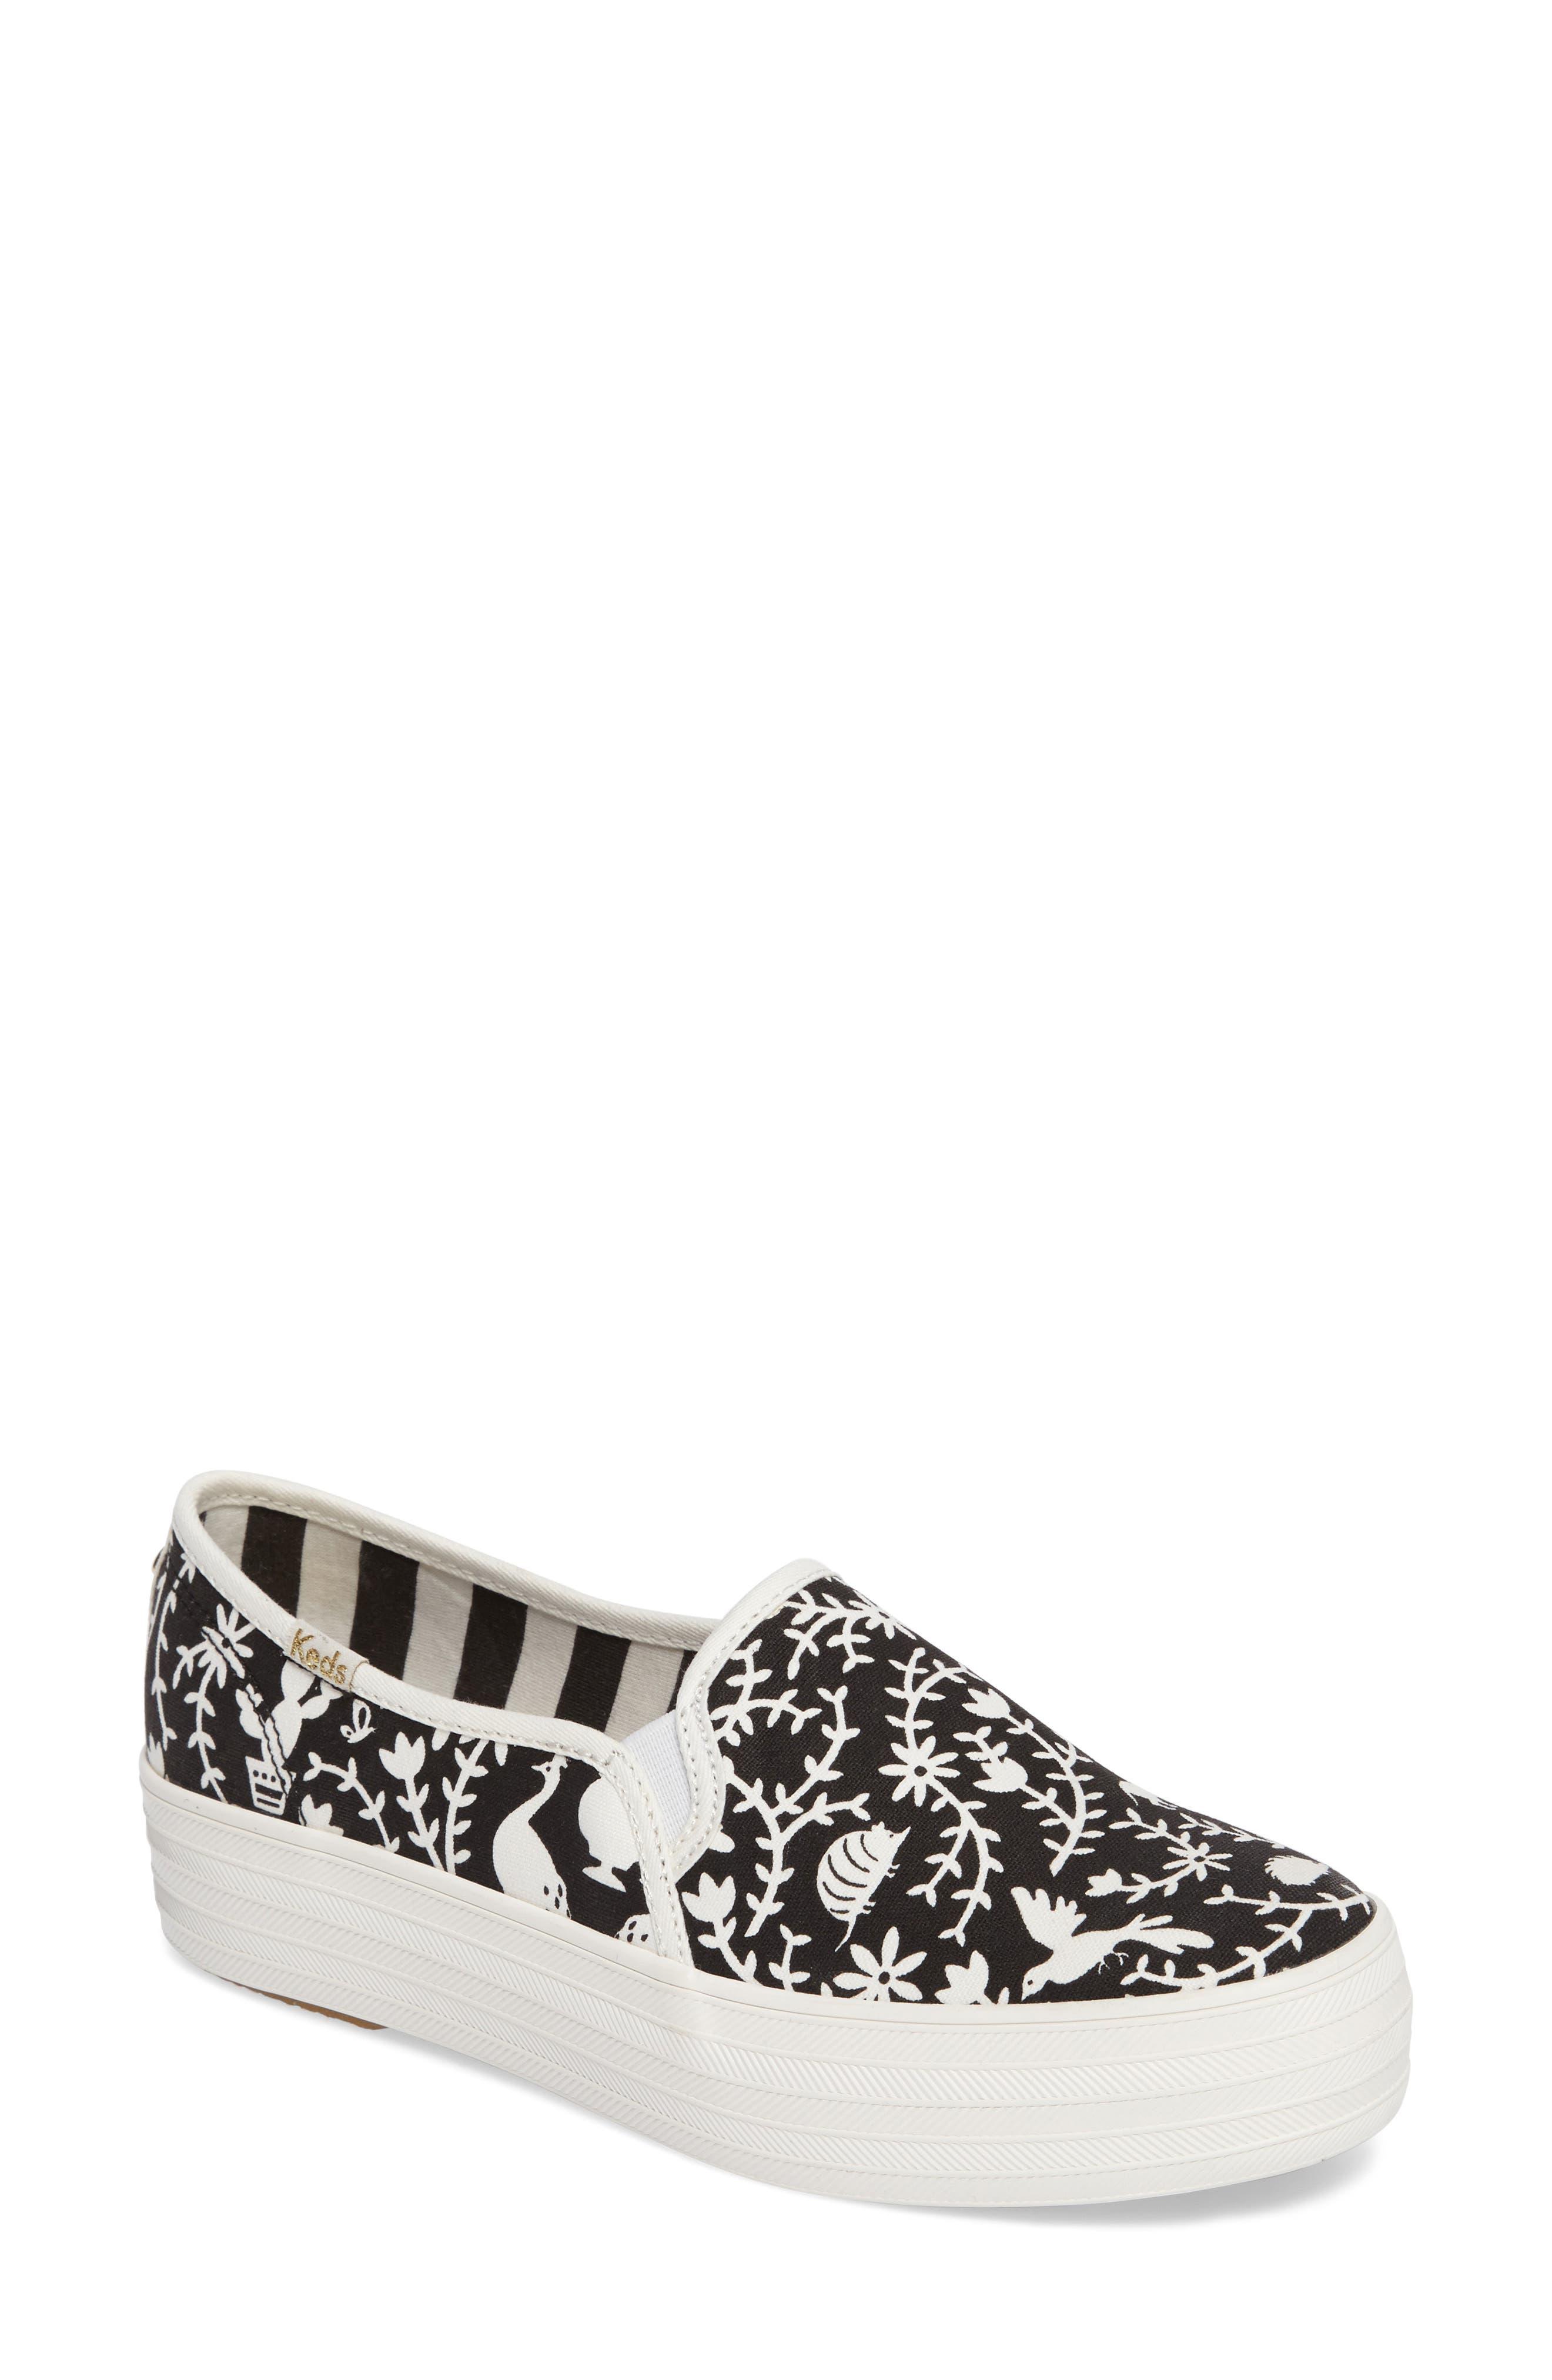 Keds<sup>®</sup> x kate spade Triple Decker Slip-On Sneaker,                         Main,                         color,